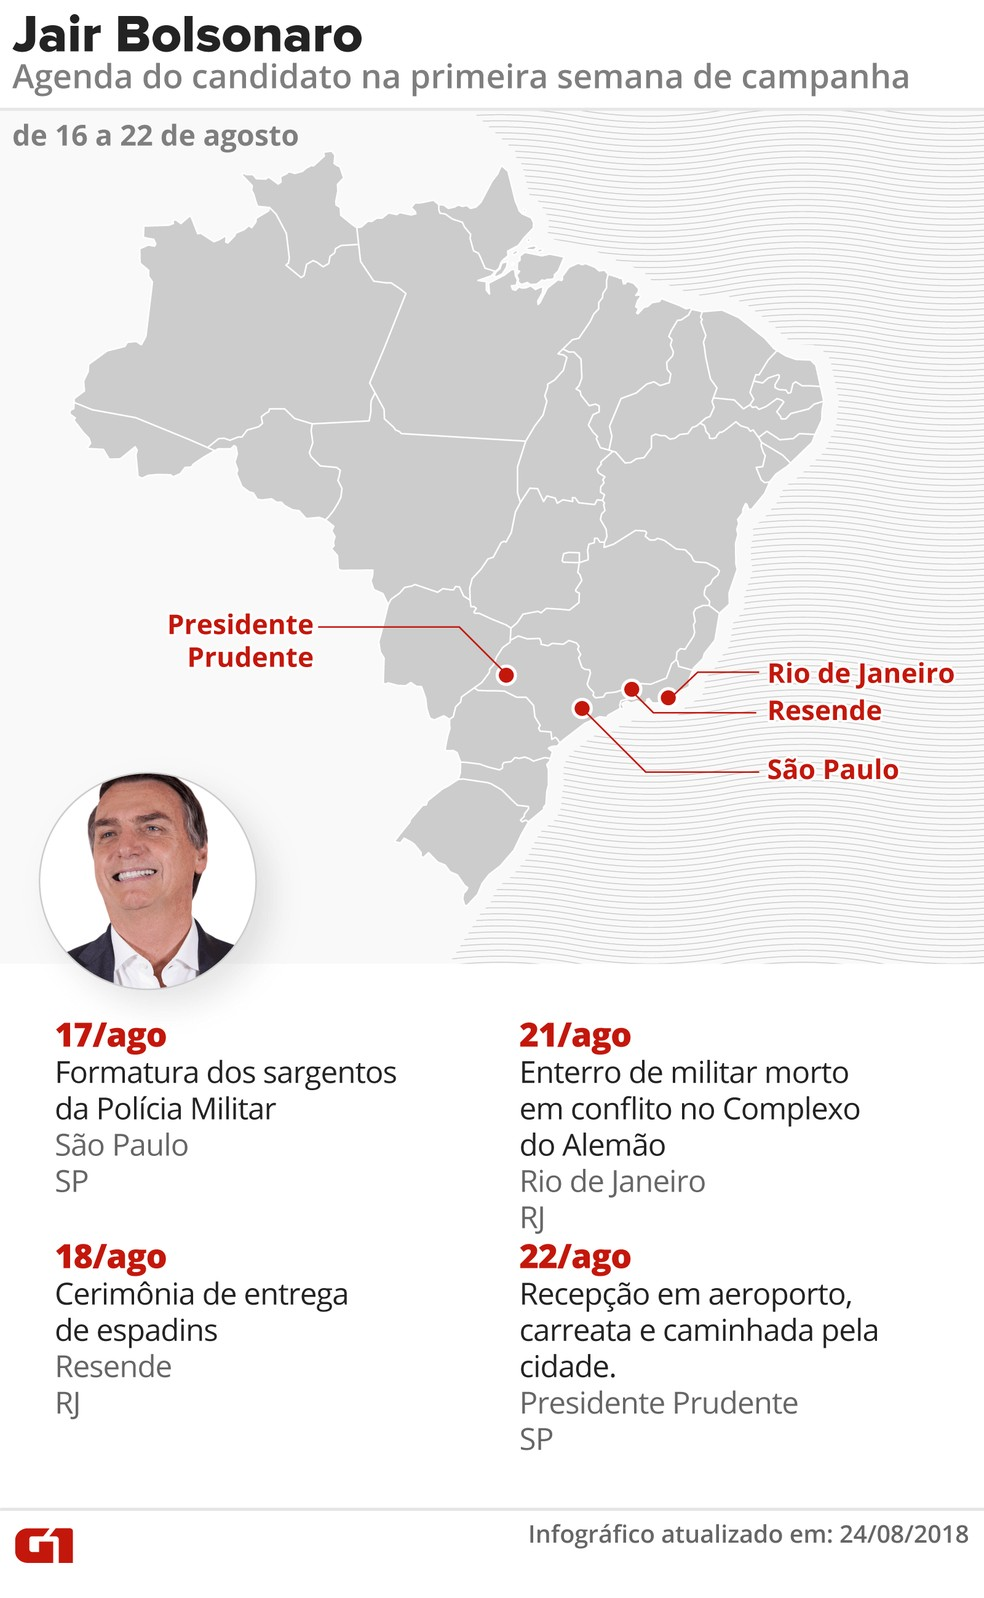 Agenda de Jair Bolsonaro (PSL) na primeira semana de campanha presidencial (Foto: Alexandre Mauro, Roberta Jaworski, Igor Estrella e Juliane Souza/G1)